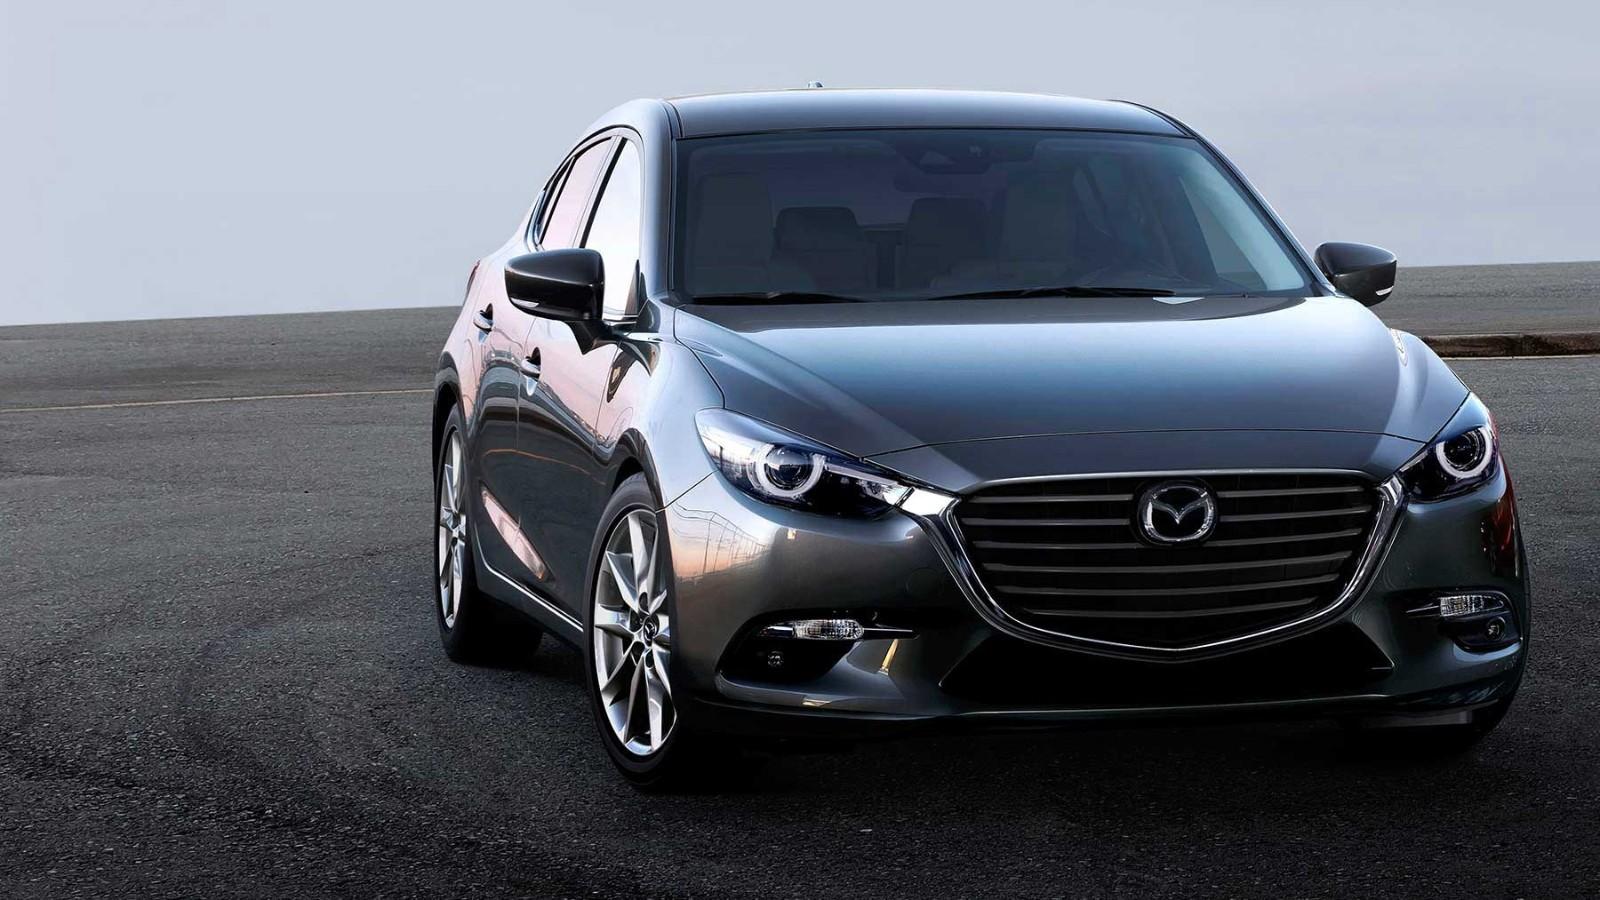 Mazda 3 Owners Manual: Rear Window Defogger